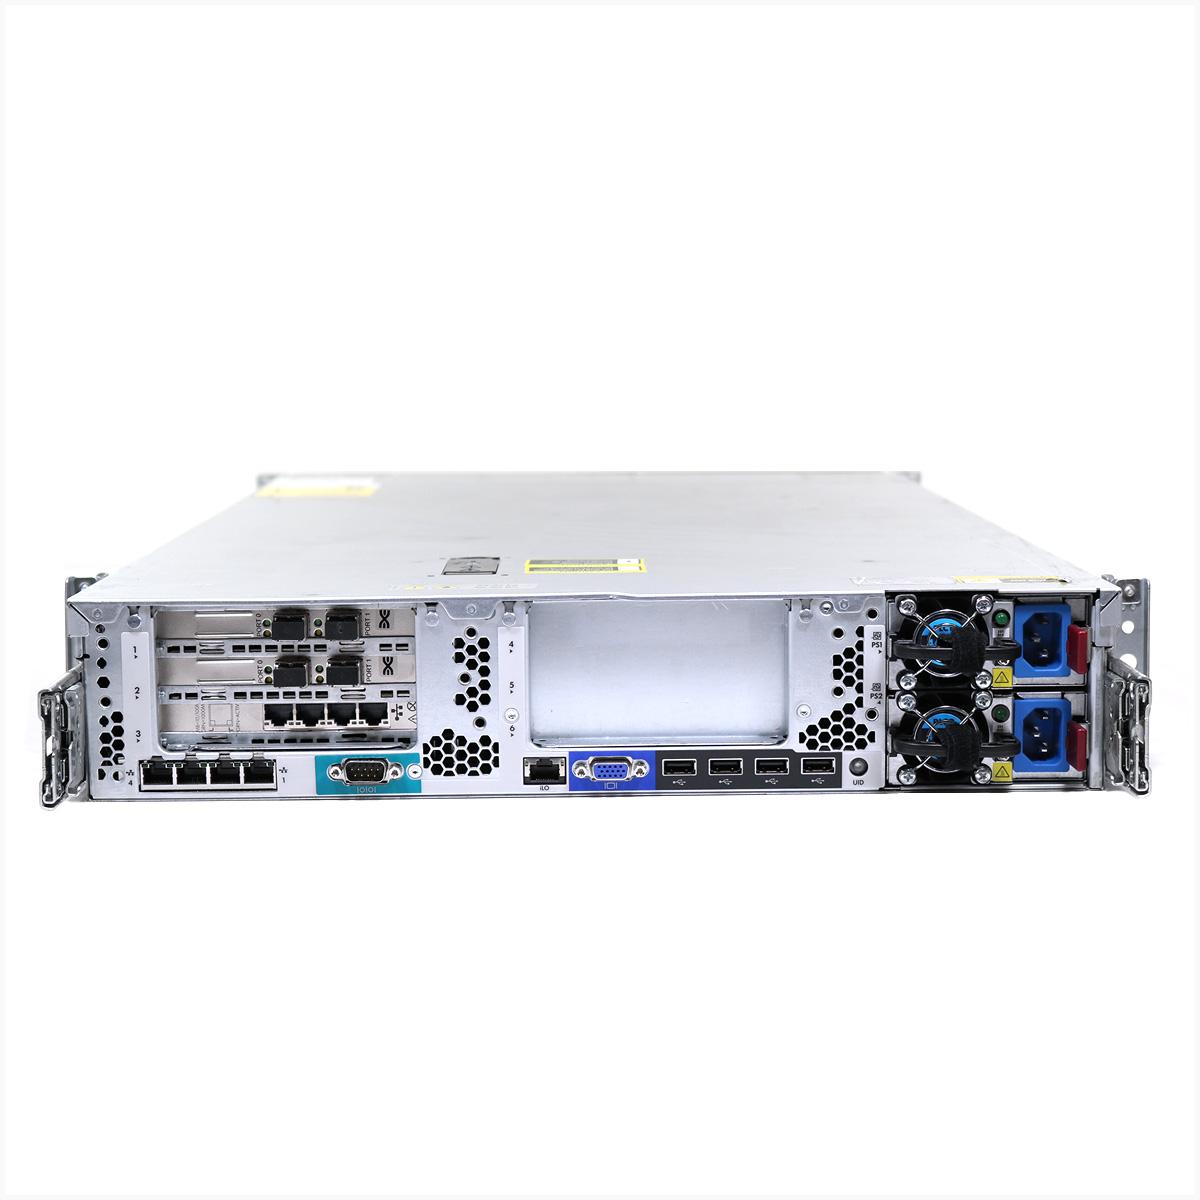 Servidor hp dl380p g8 2x xeon e5-2650 128gb  2x 1tb - usado